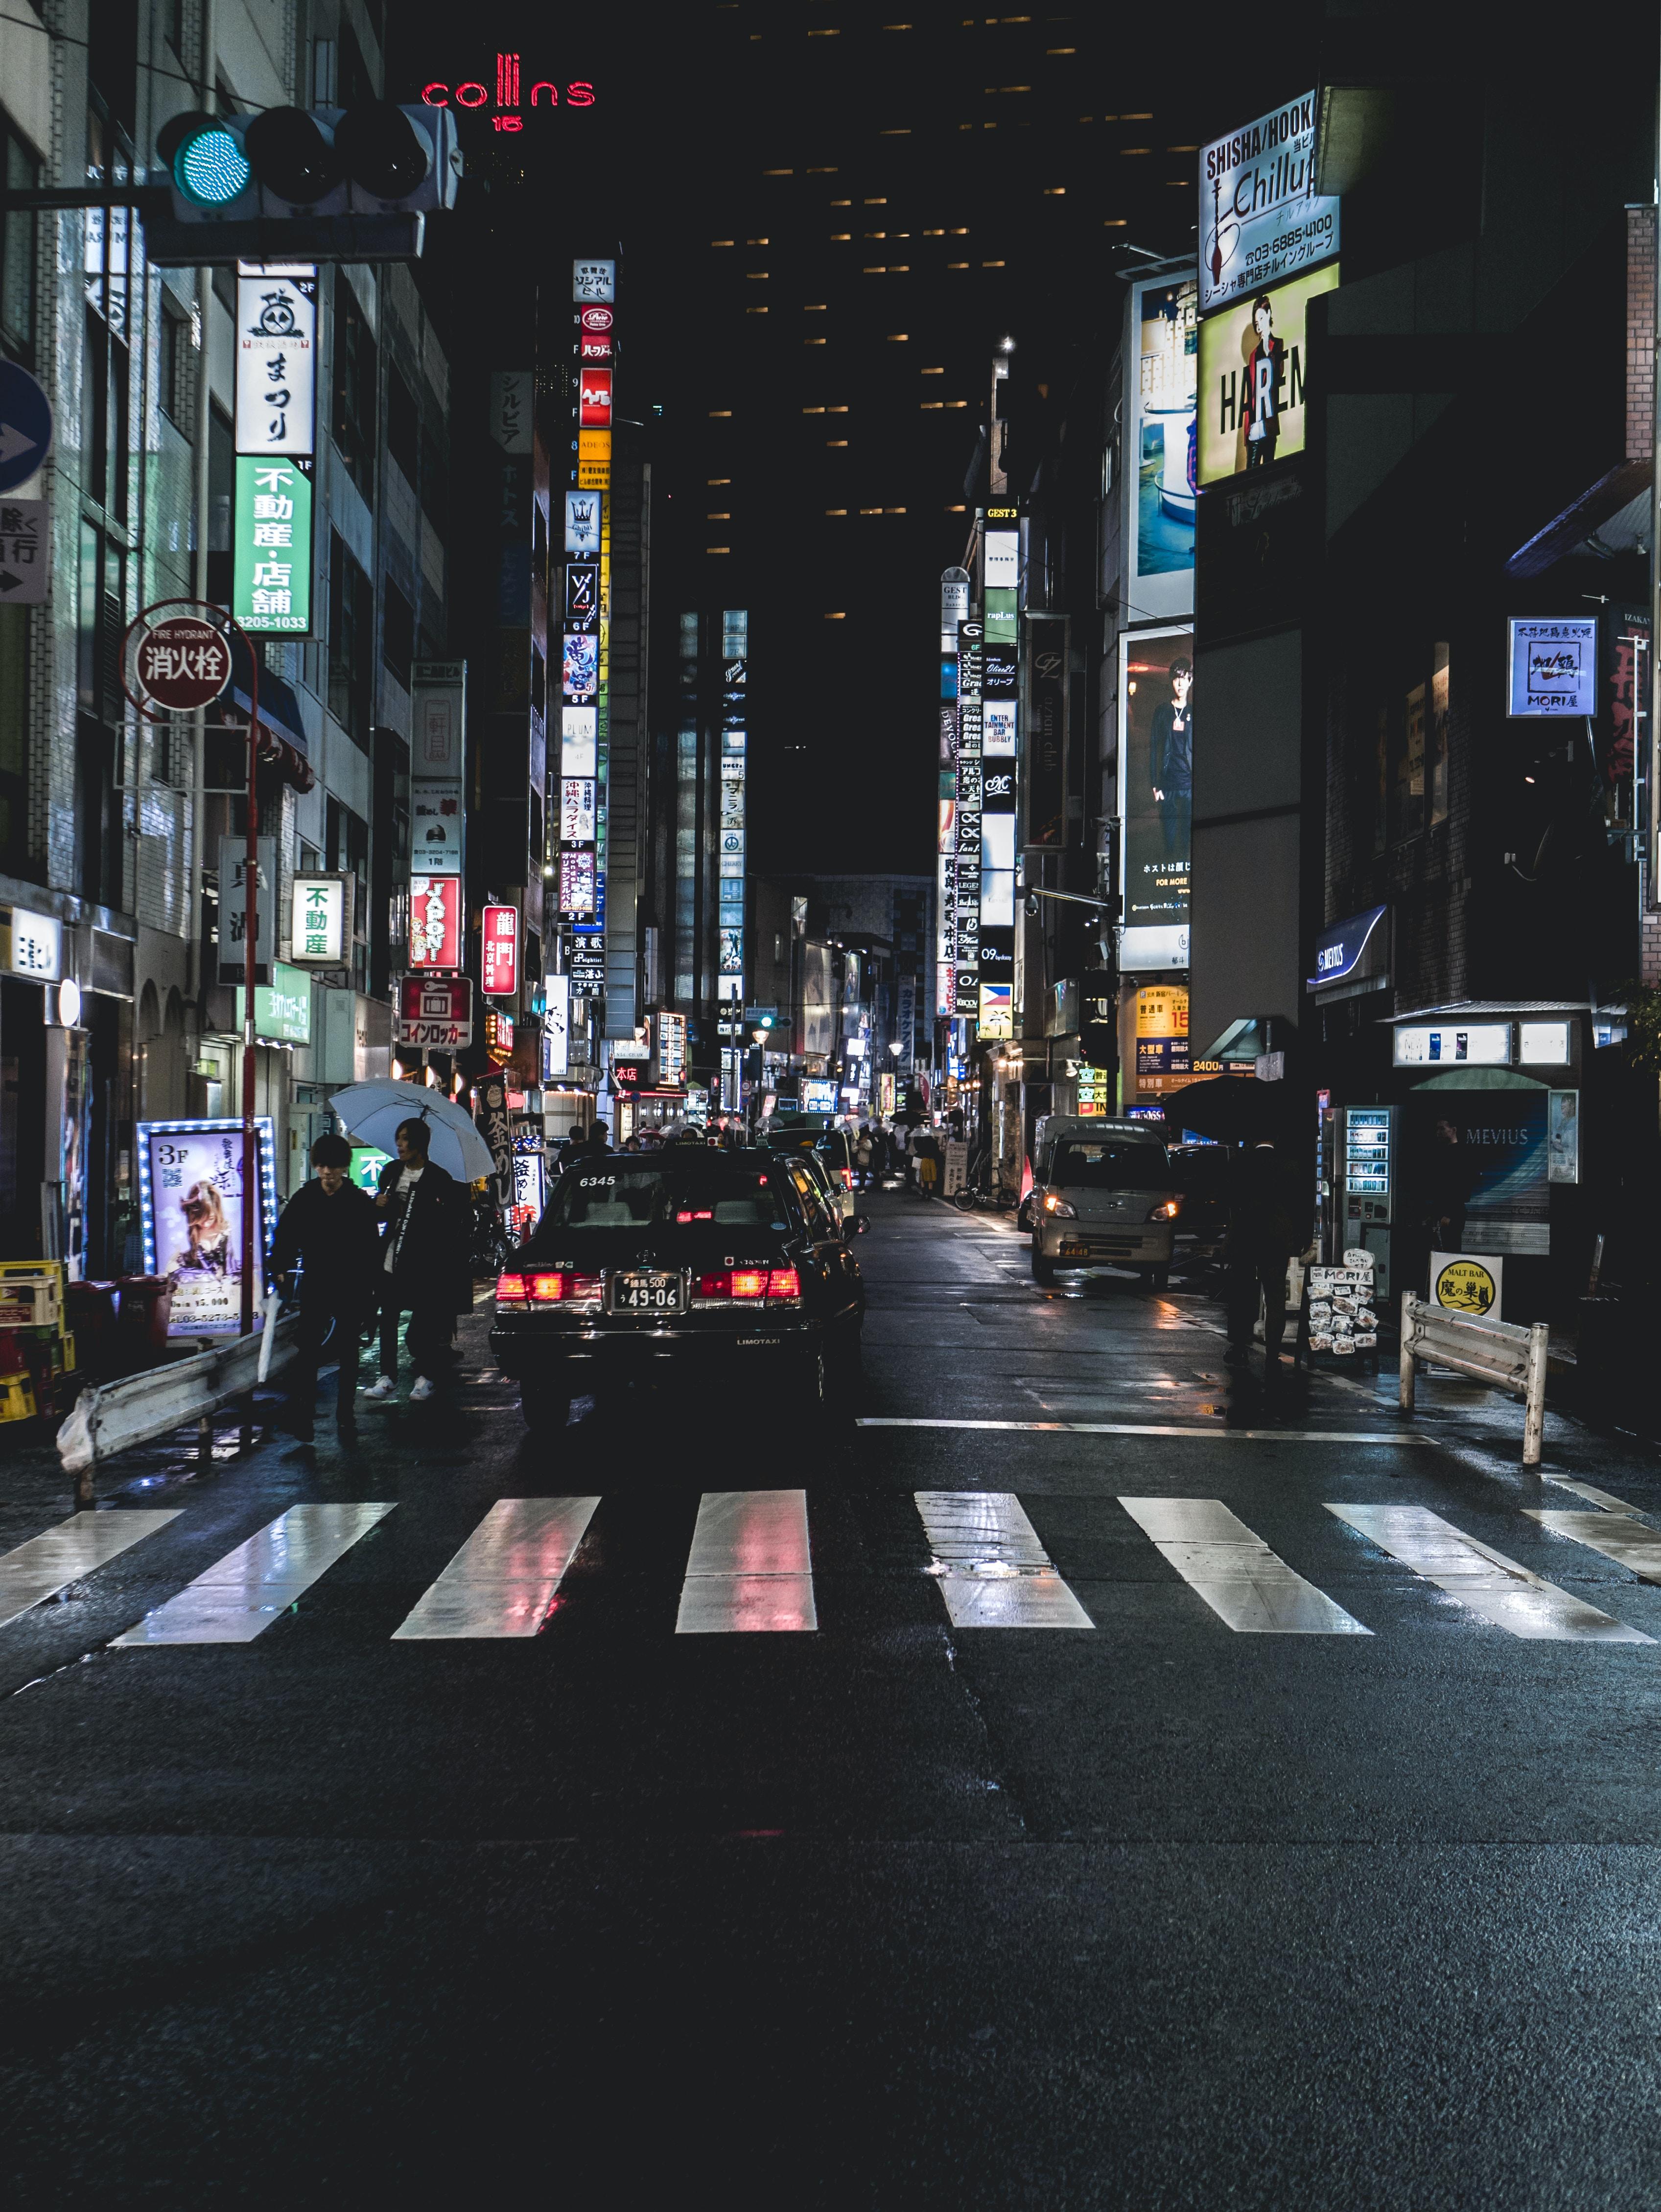 black car on road during nighttime